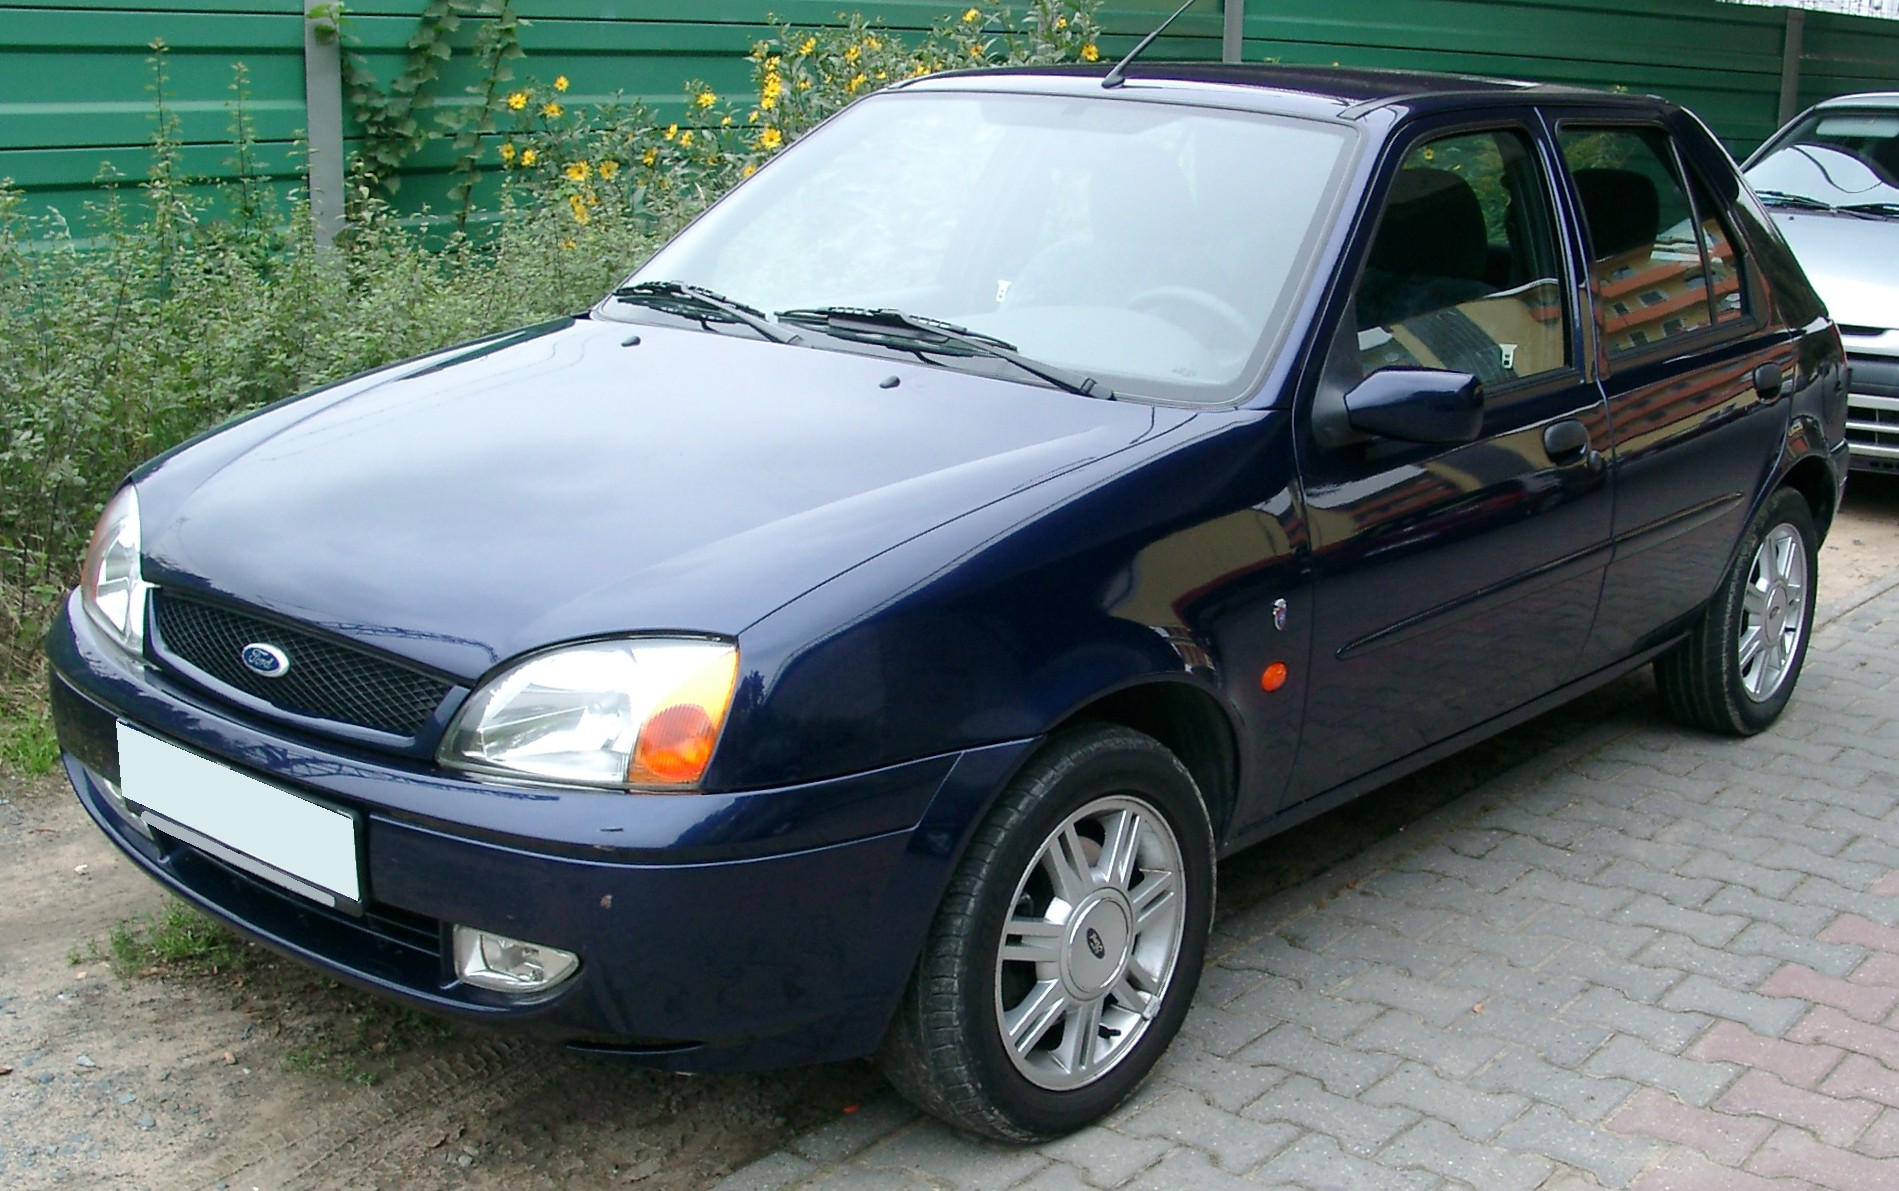 Ford_Fiesta_MK5_front_20071002.jpg